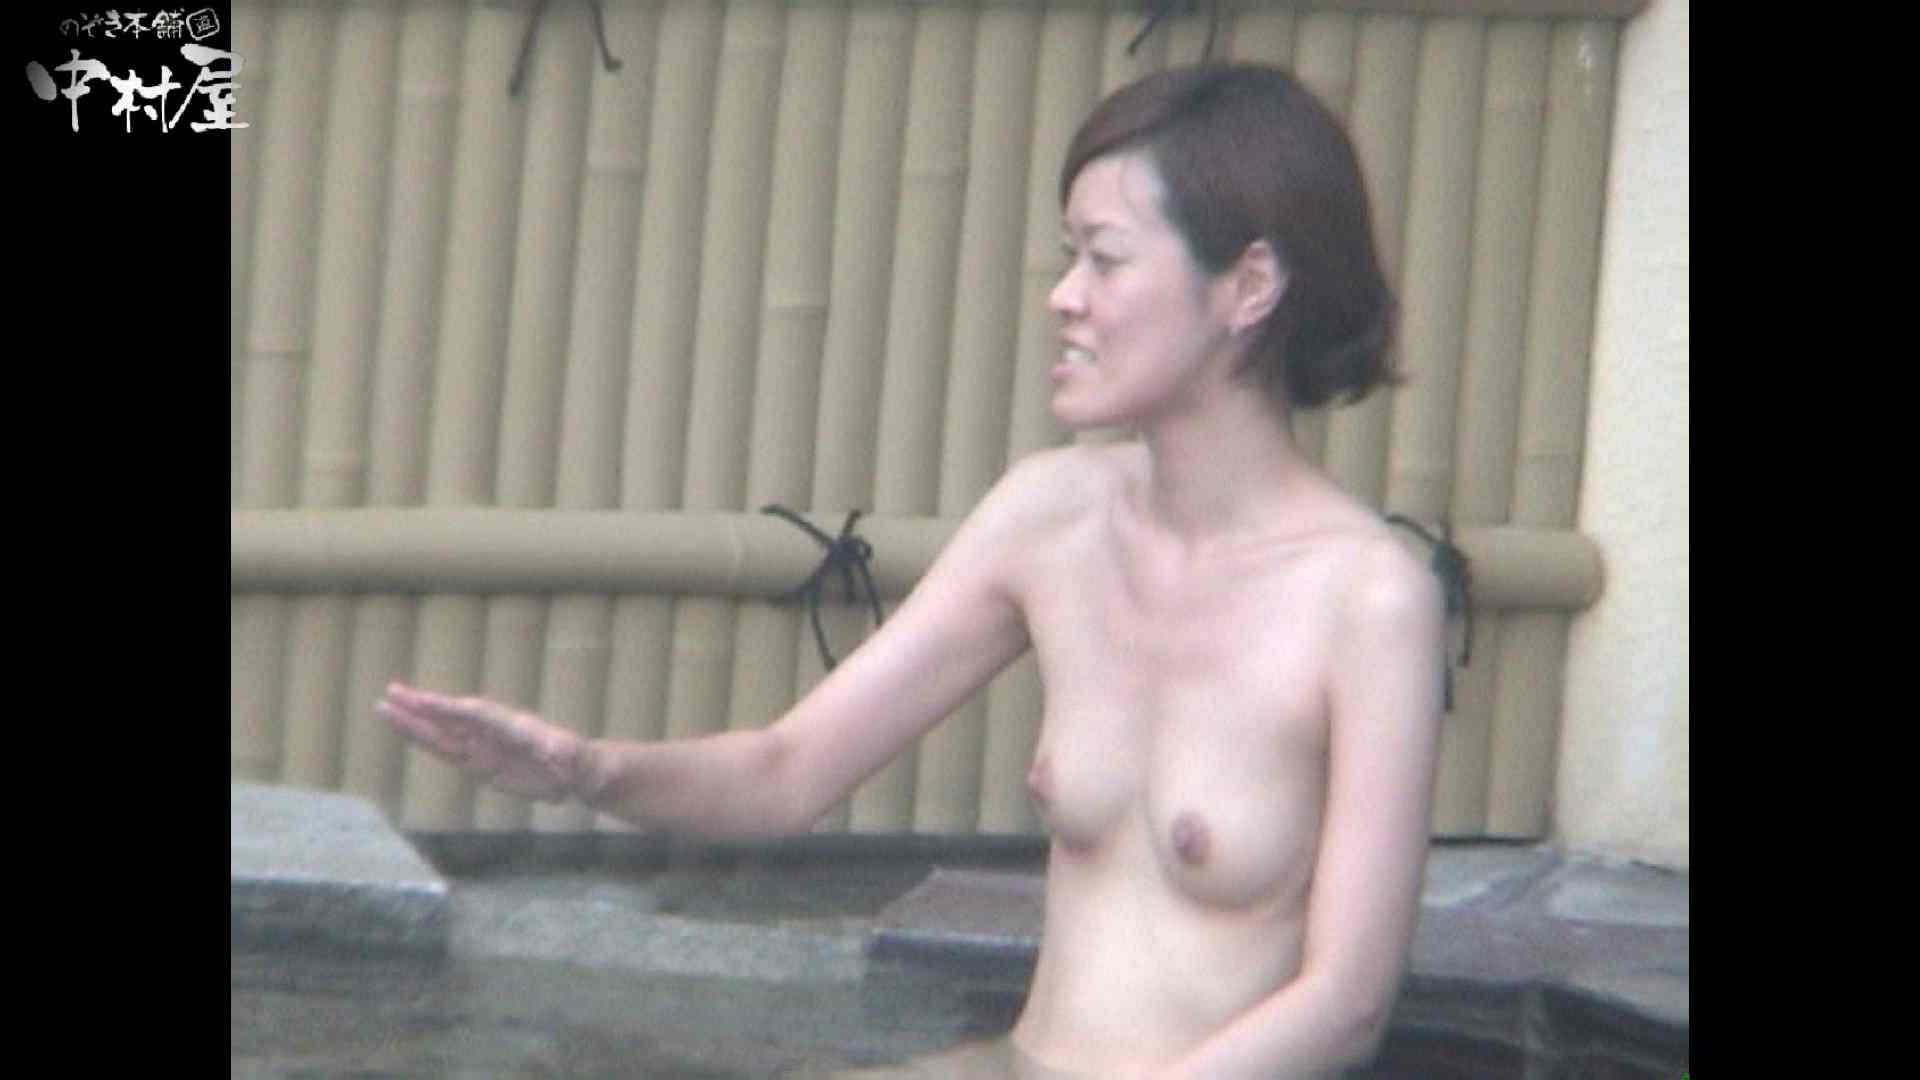 Aquaな露天風呂Vol.961 OLセックス | 盗撮  86画像 37